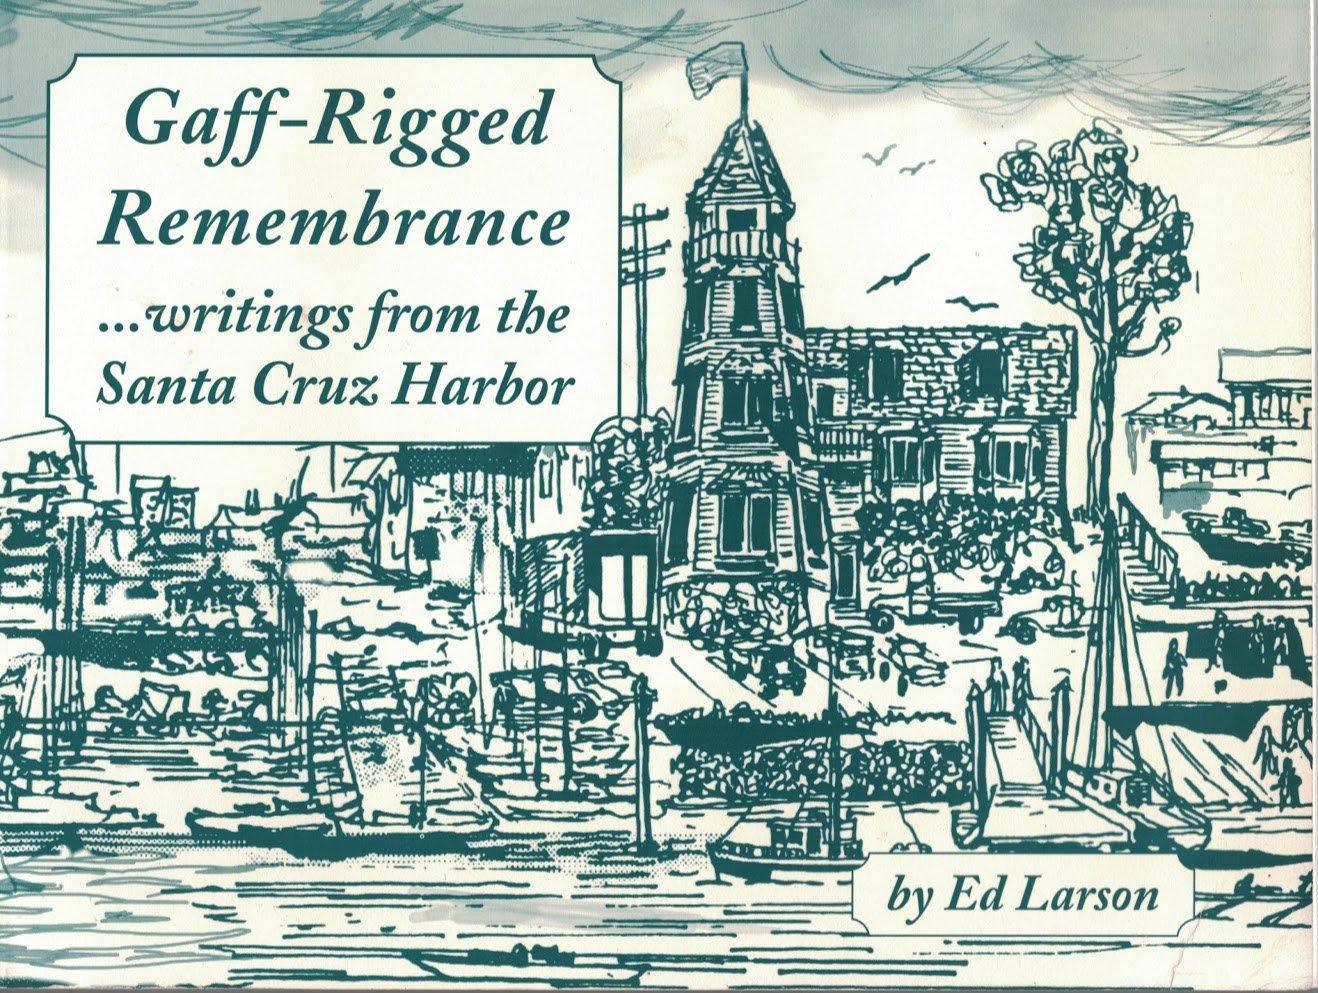 Gaff-rigged remembrance: Writings from the Santa Cruz Harbor pdf epub